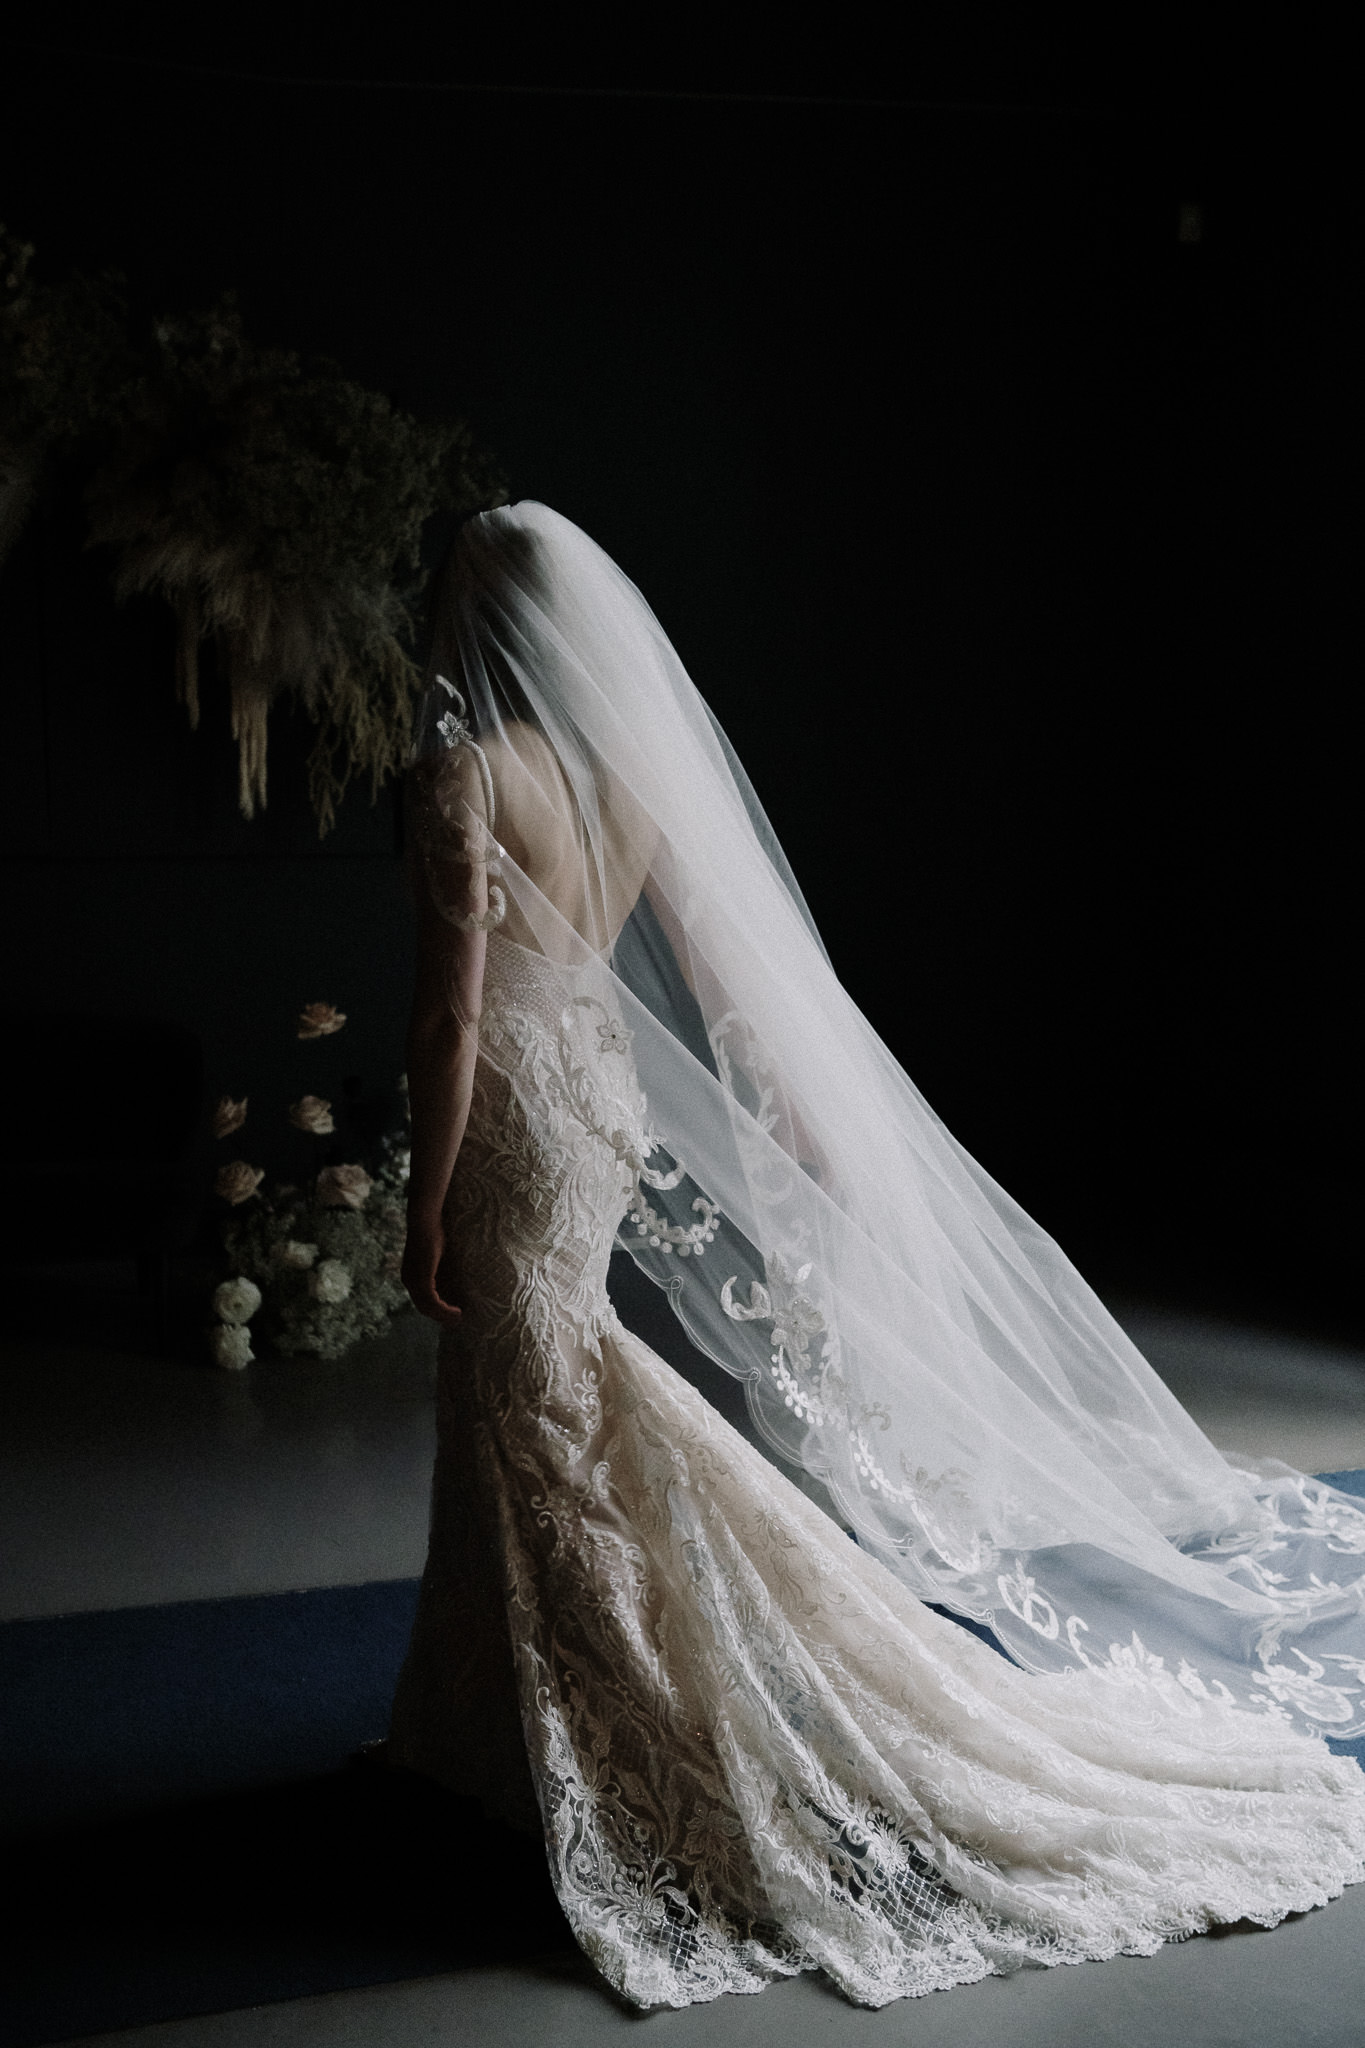 ethereal-portrait-of-bride-in-lace-wedding-gown-by-naomi-van-der-kraan